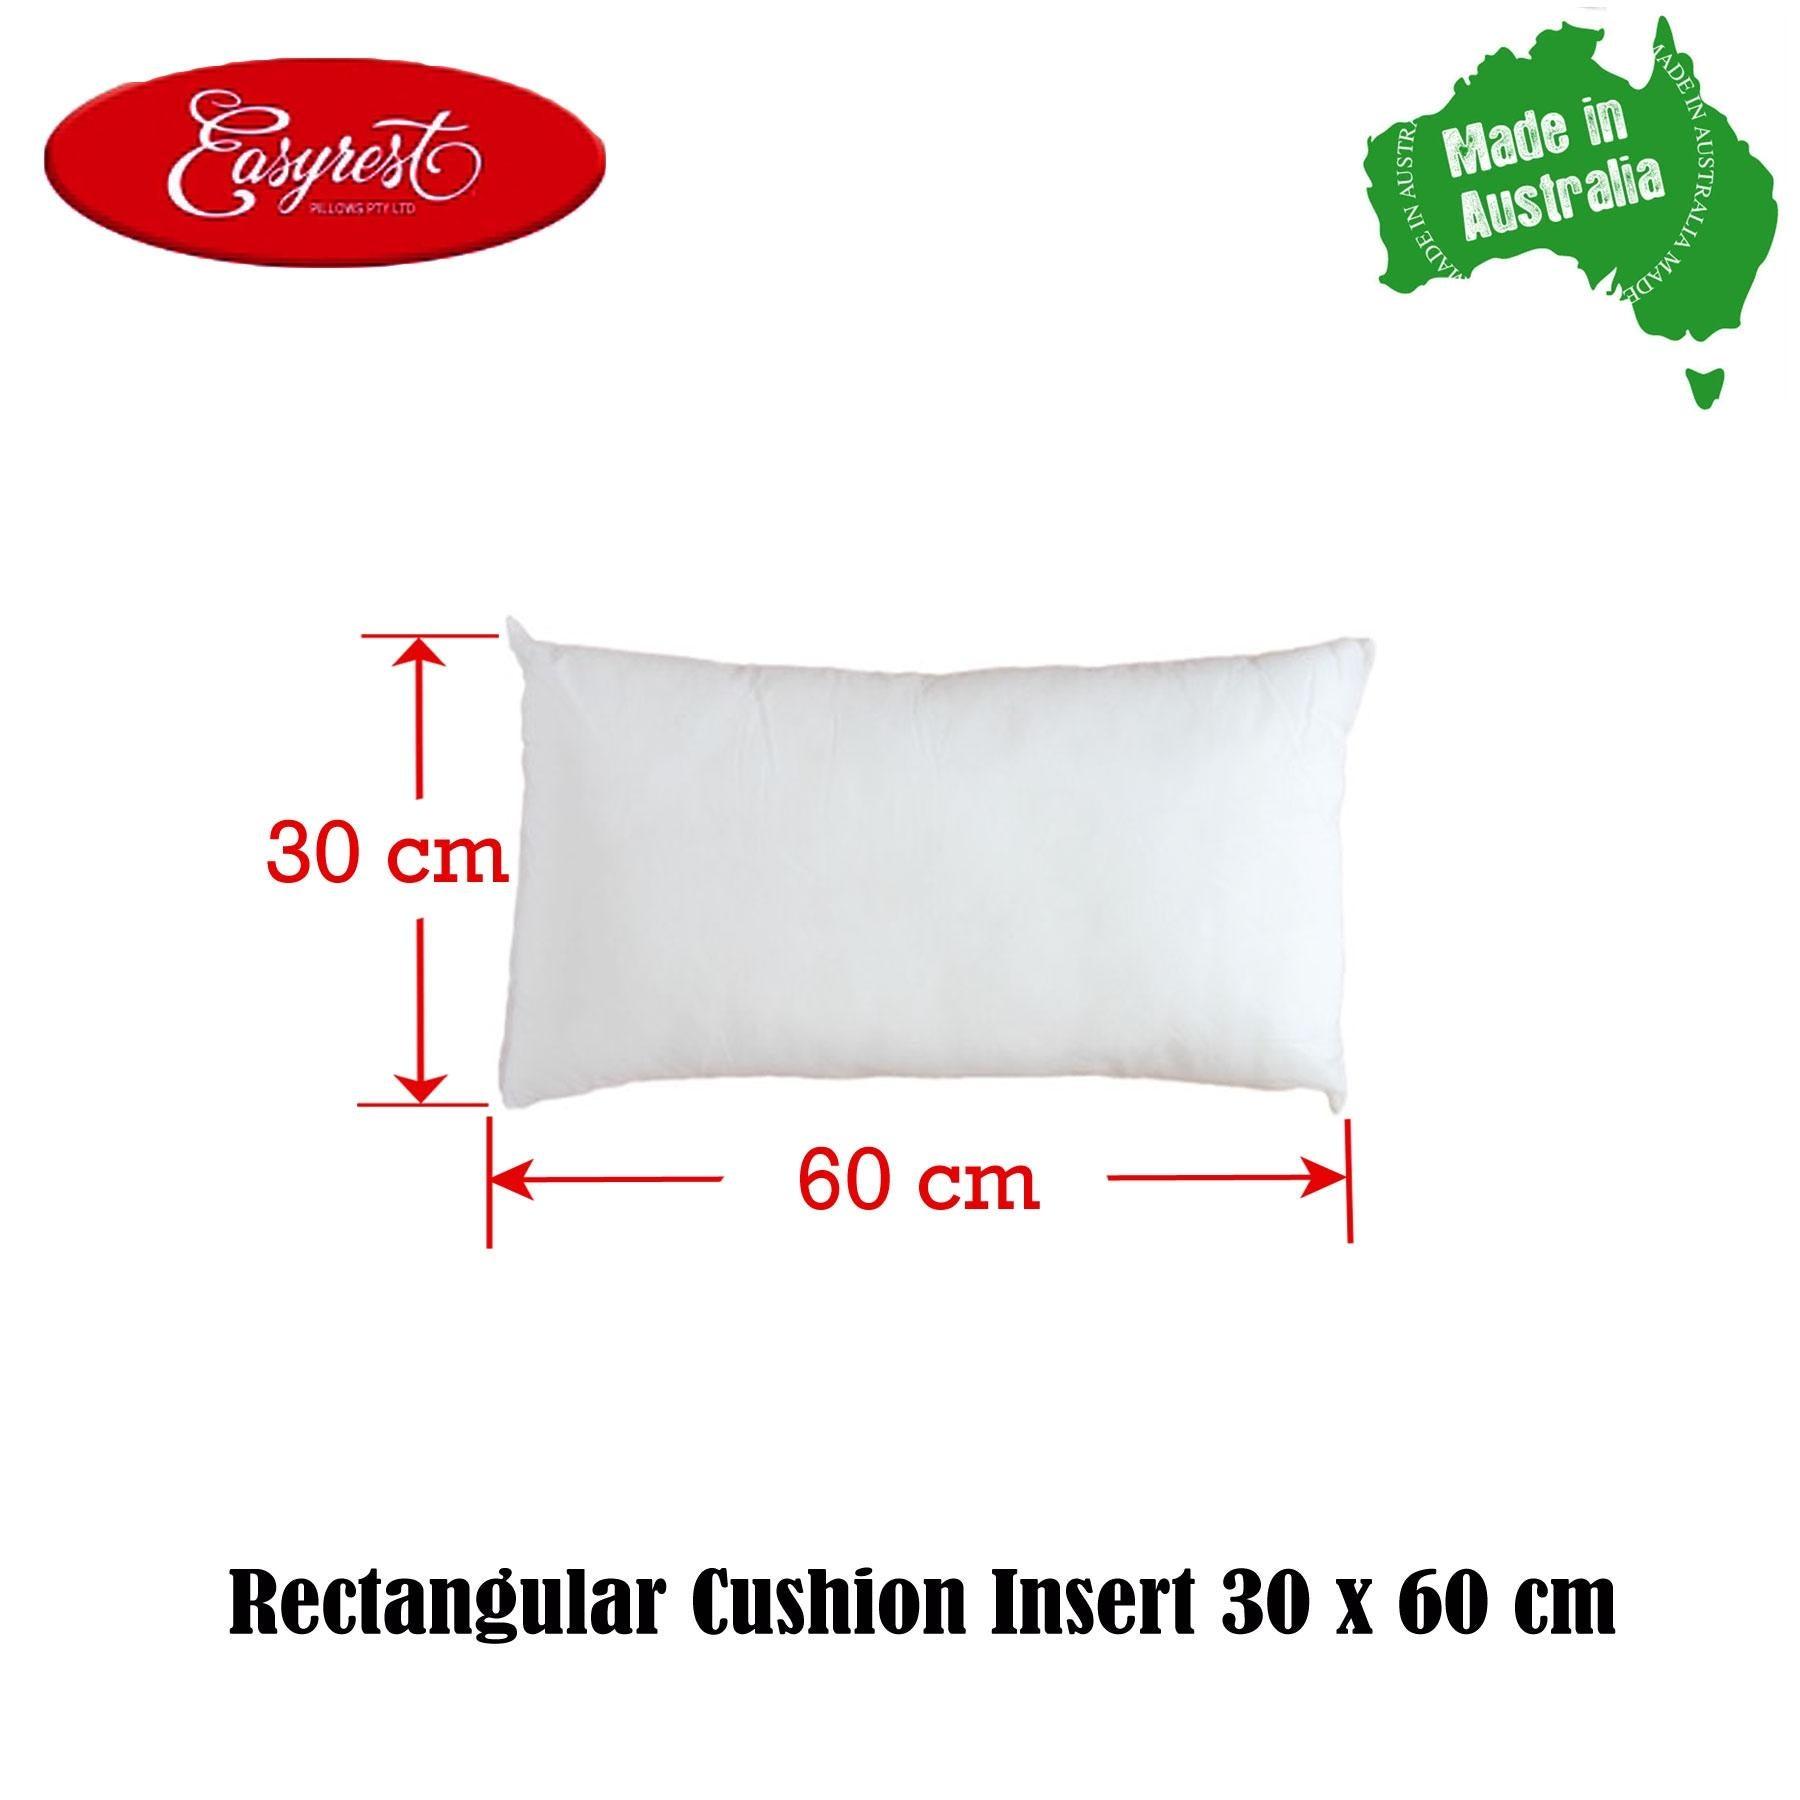 cushion insert rectangular 30 x 60cm